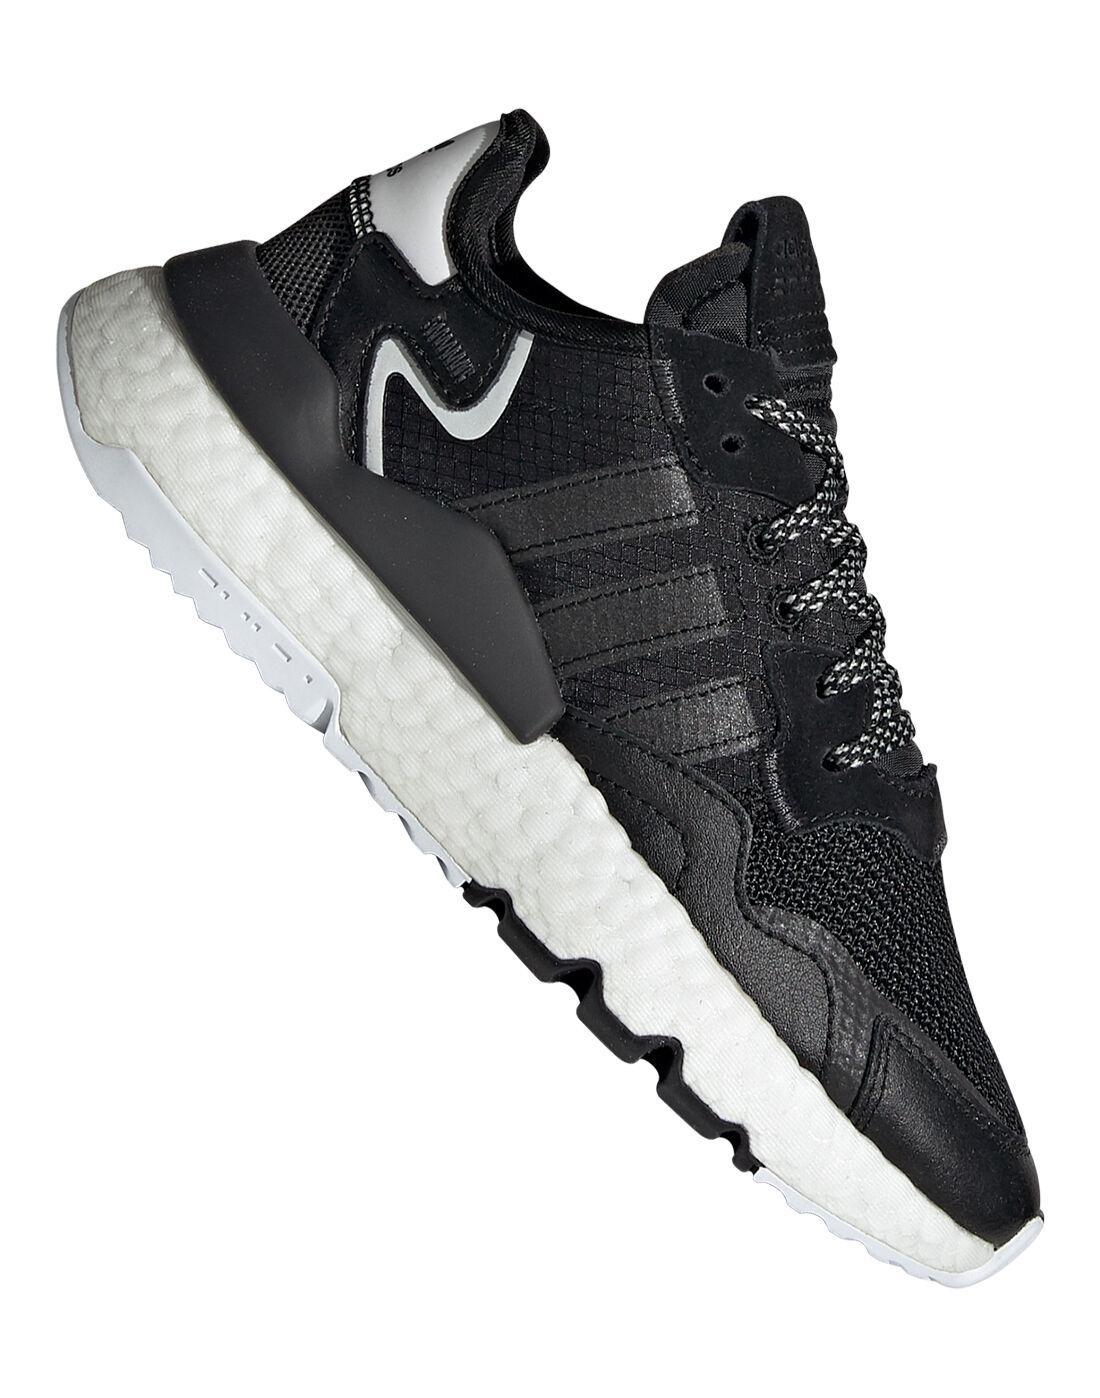 Black adidas Originals Nite Jogger